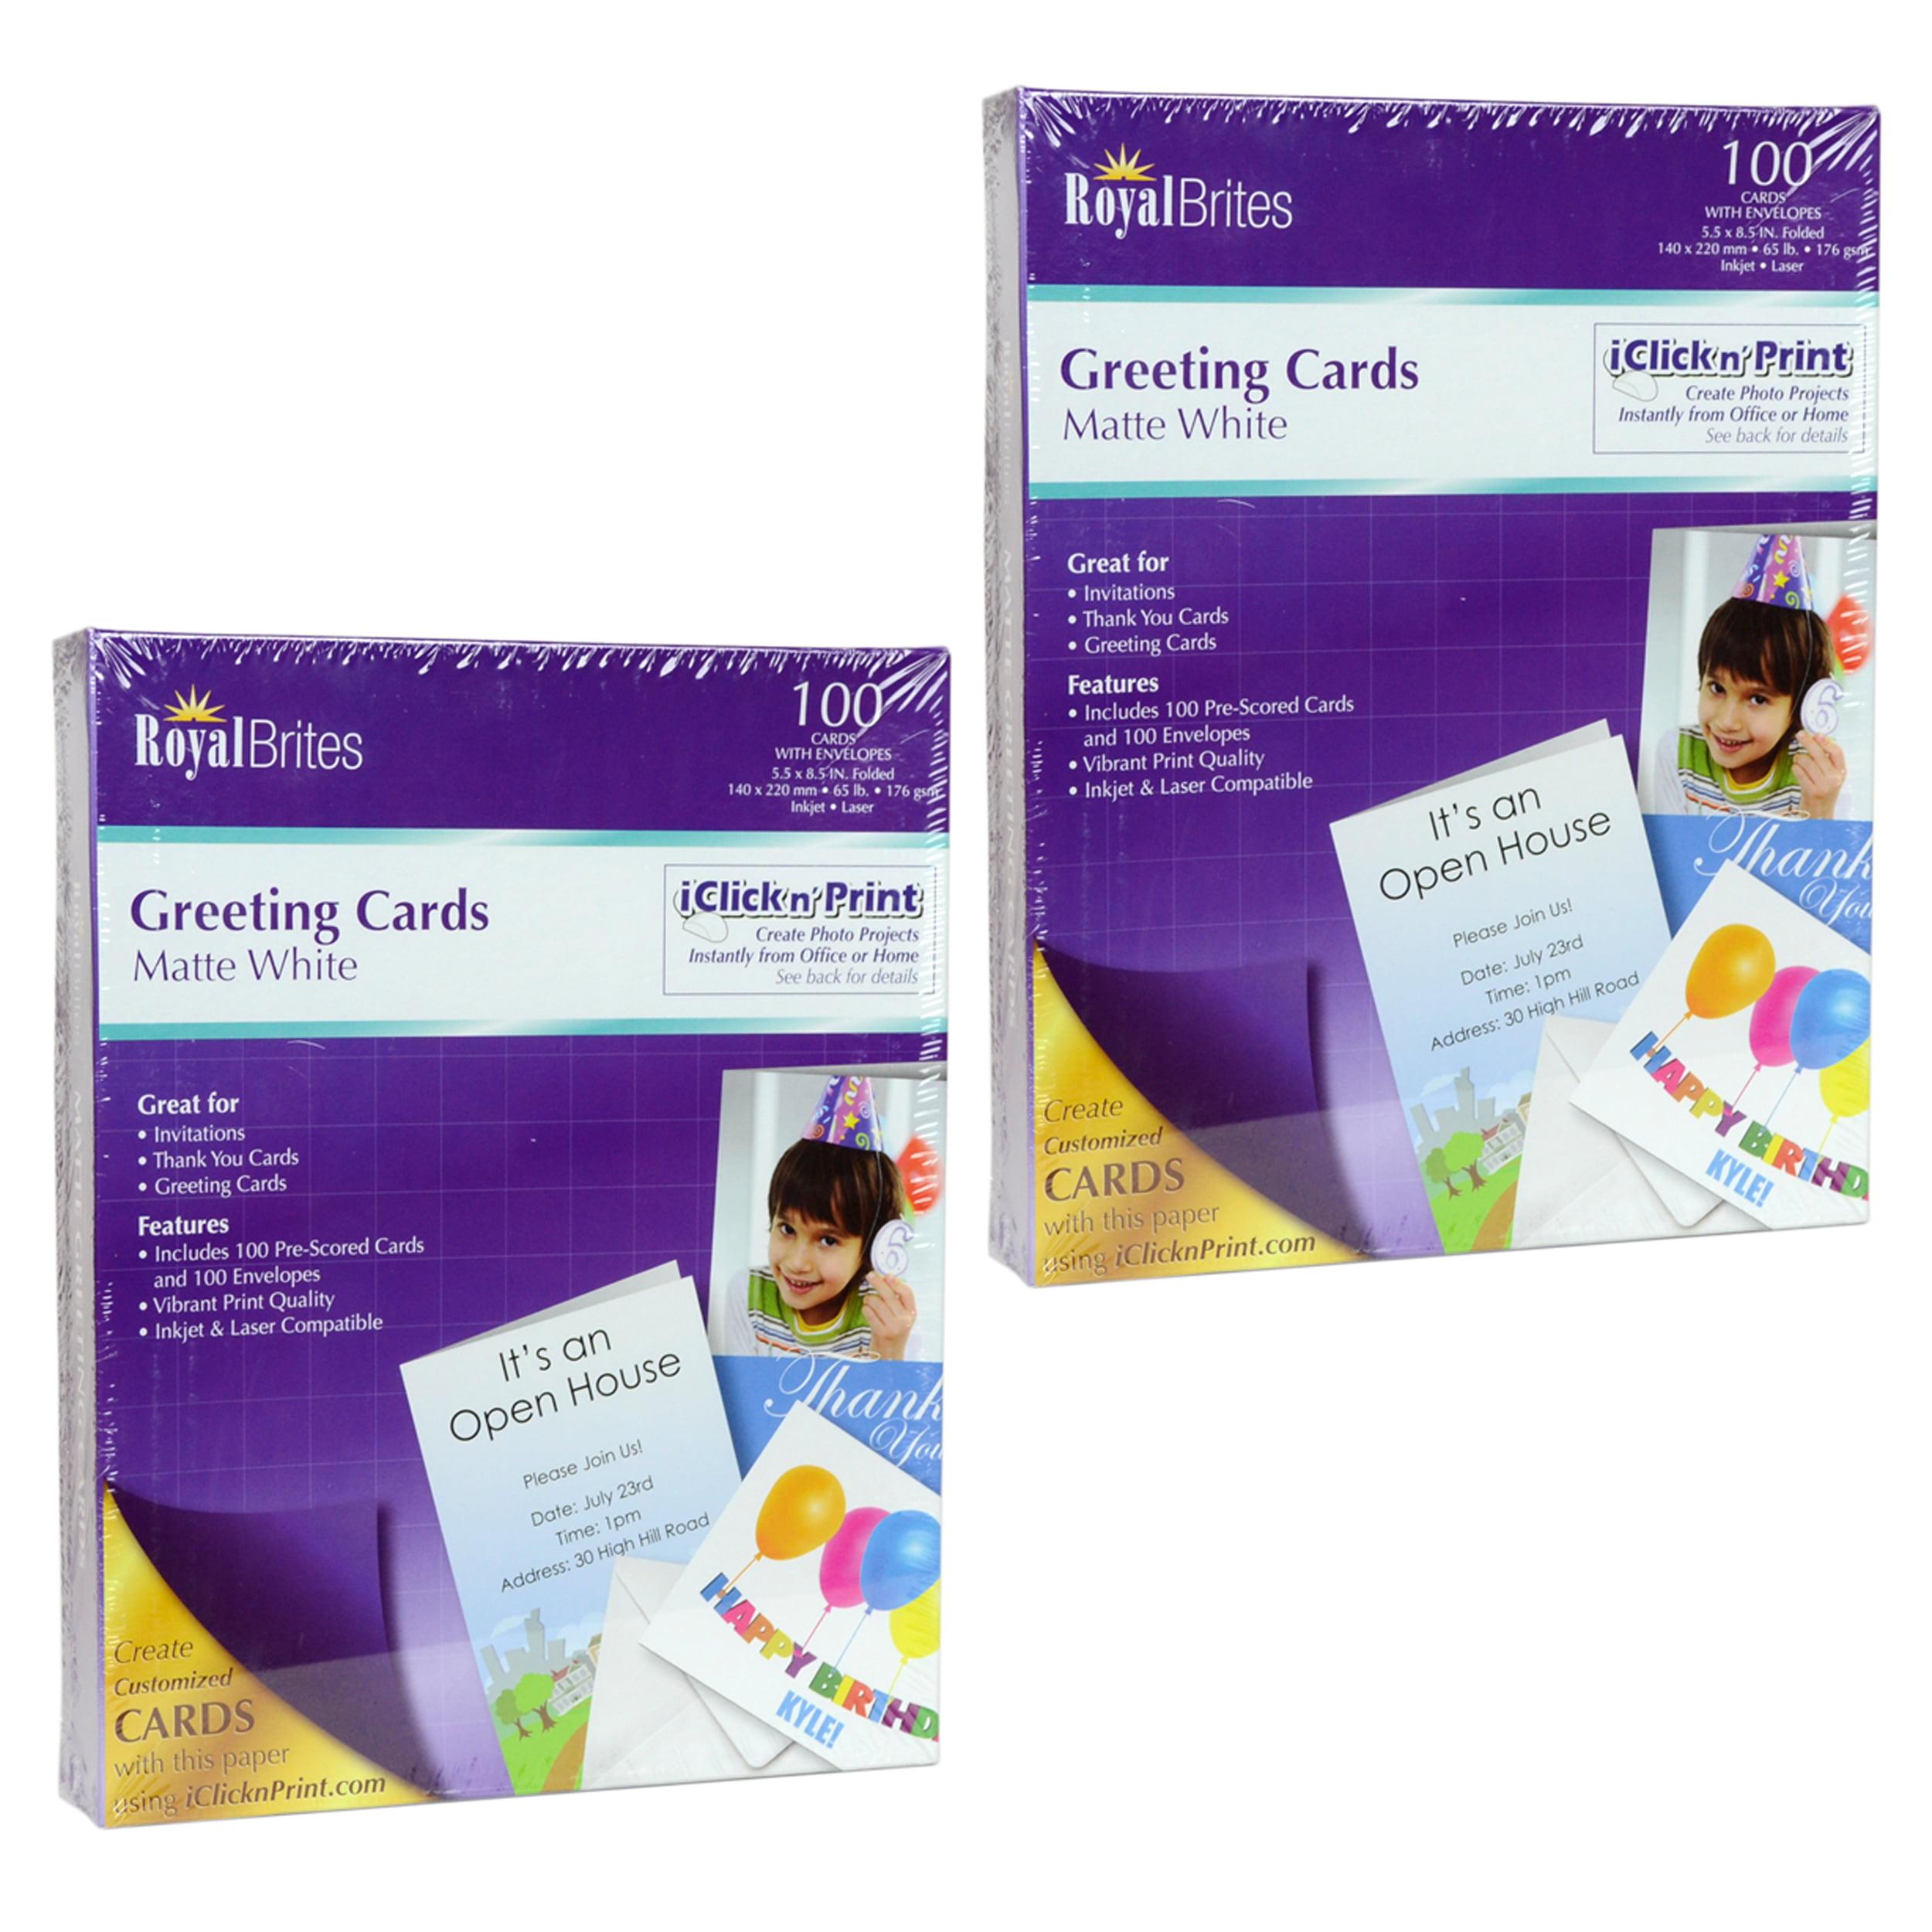 Royal brites 100ct matte white greeting card stock 85 x 11 w royal brites 100ct matte white greeting card stock 85 x 11 w envelopes 2 pack walmart m4hsunfo